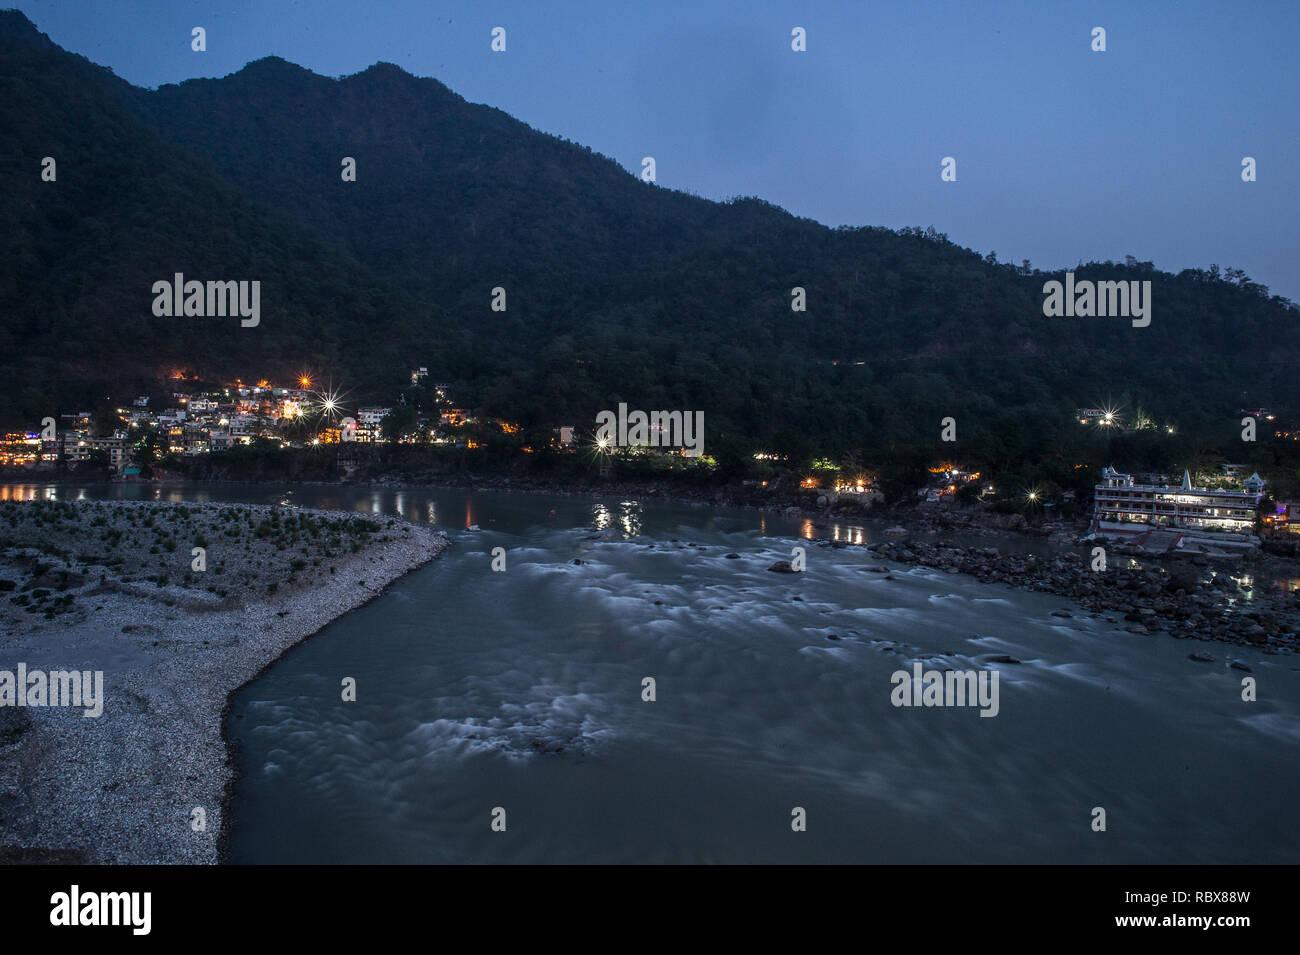 Ganges River, Rishikesh, India - Stock Image